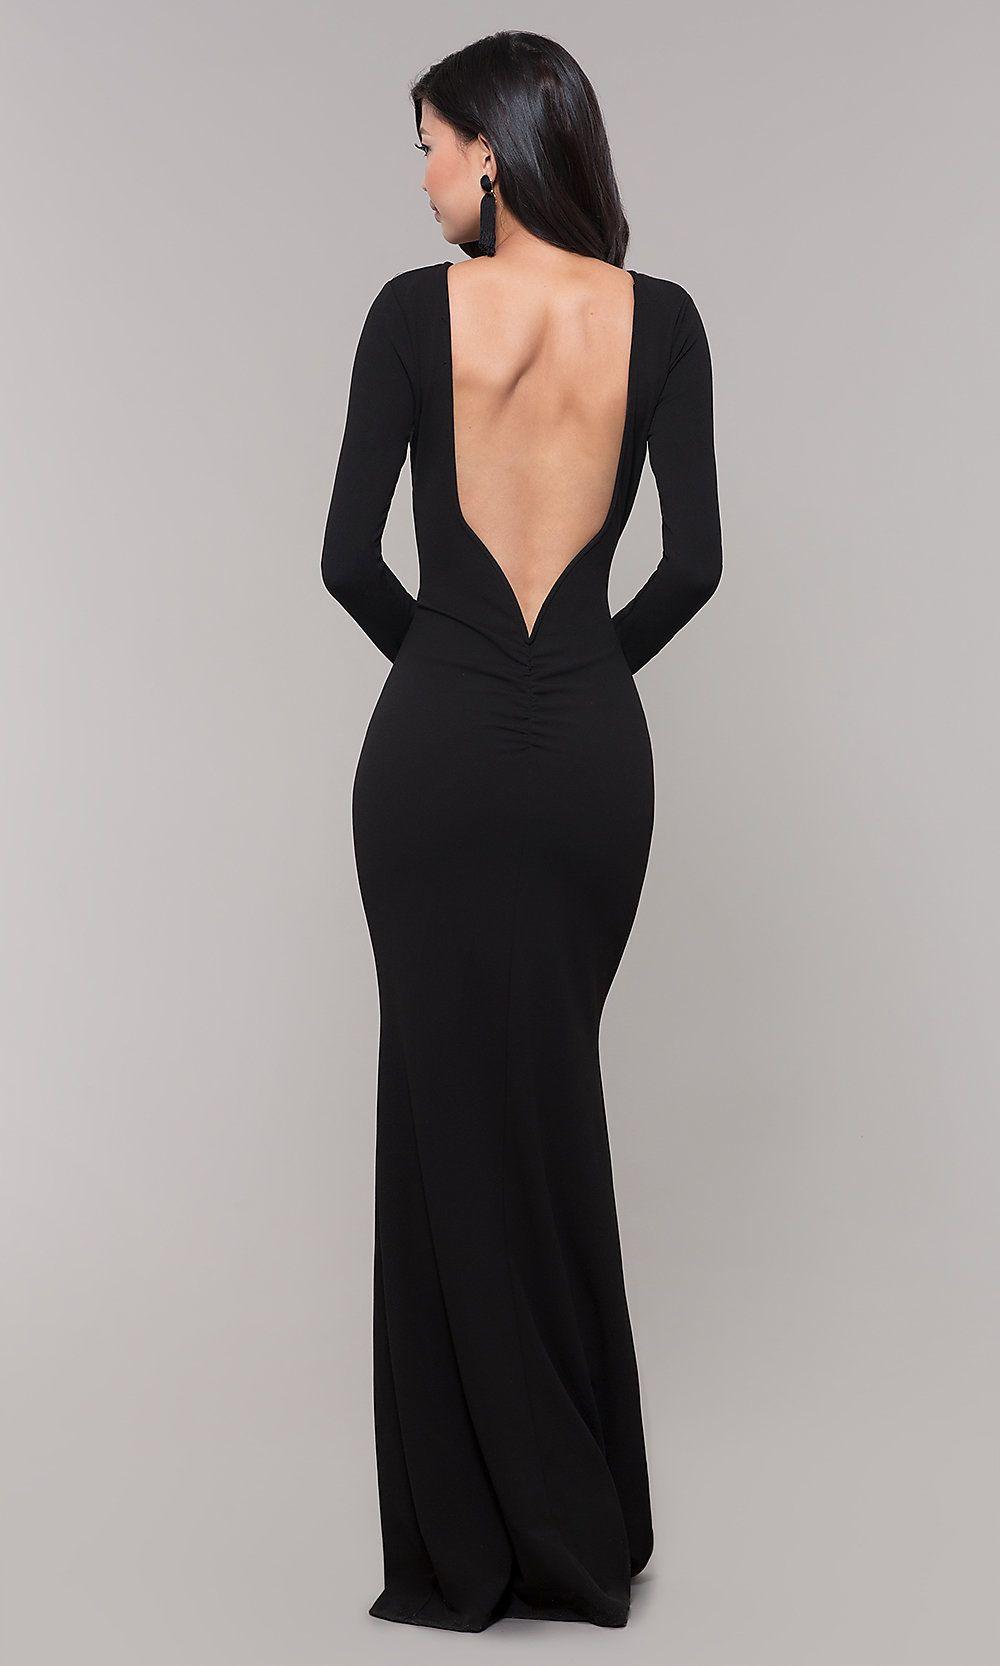 Open Back Long Black Prom Dress With Long Sleeves Black Tie Event Dresses Long Sleeve Black Gown Long Sleeve Dress Formal